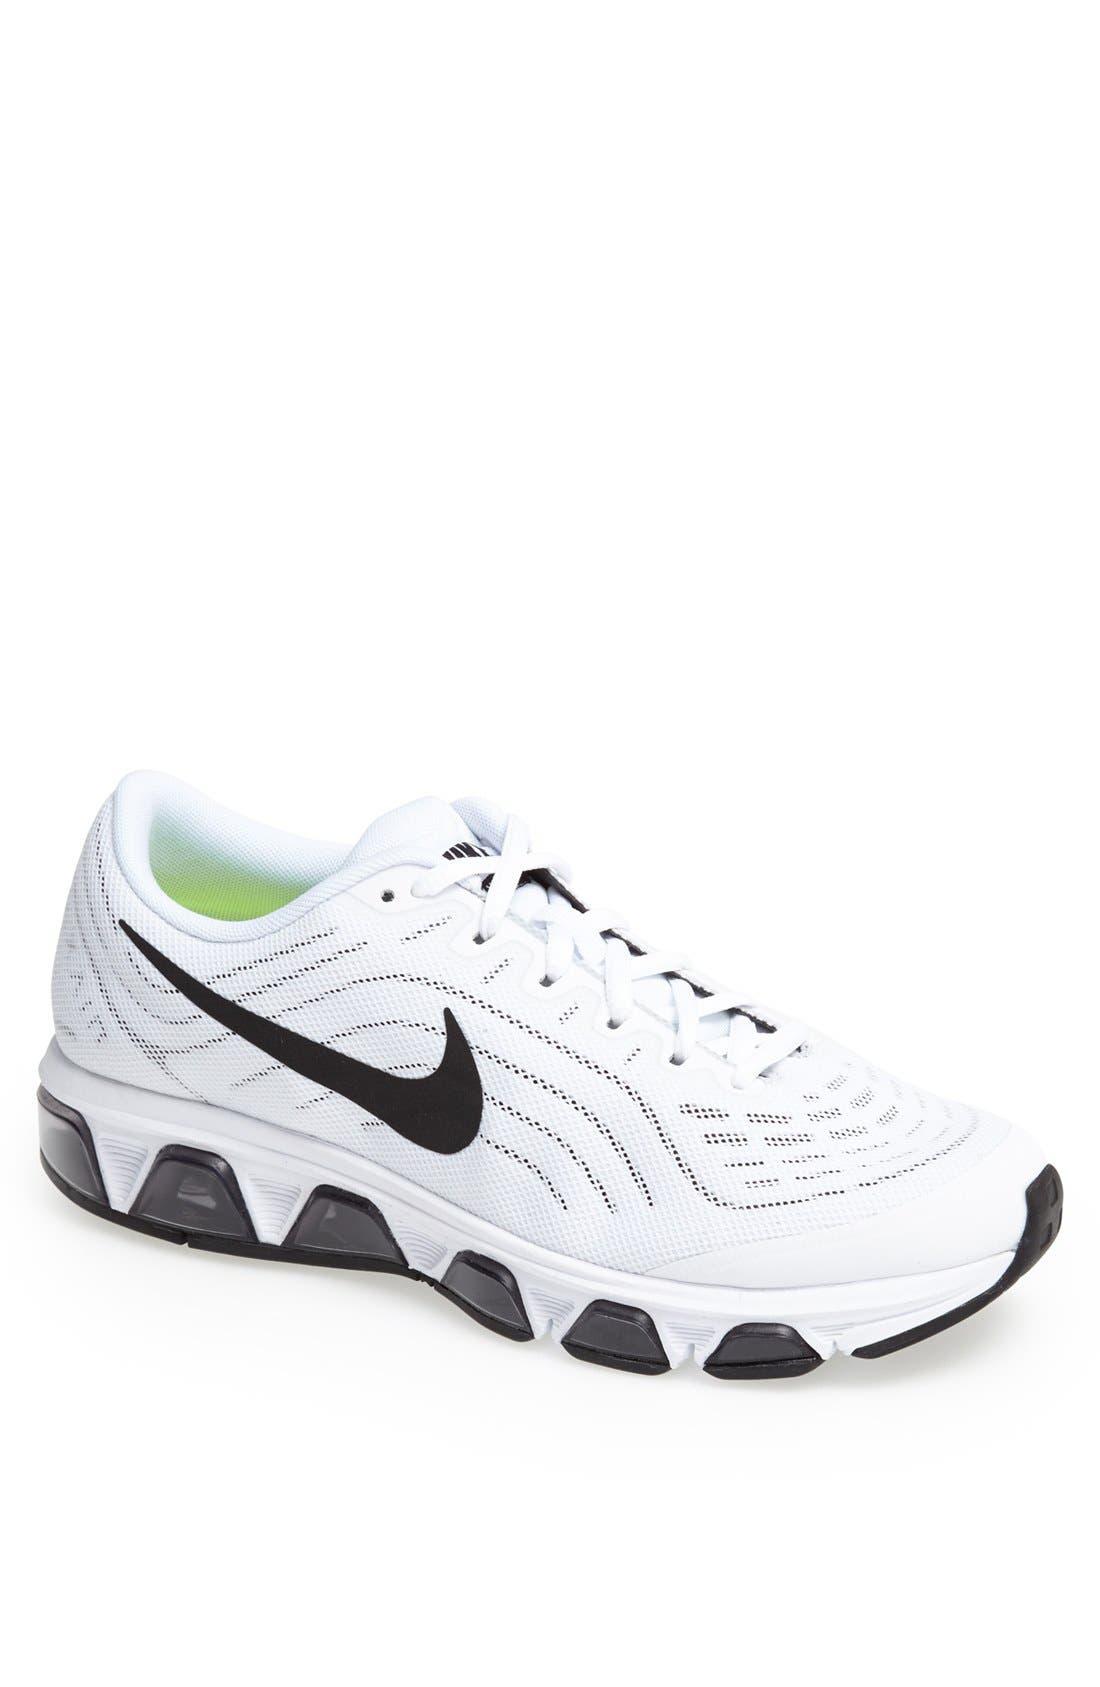 Main Image - Nike 'Air Max Tailwind 6' Running Shoe (Men)